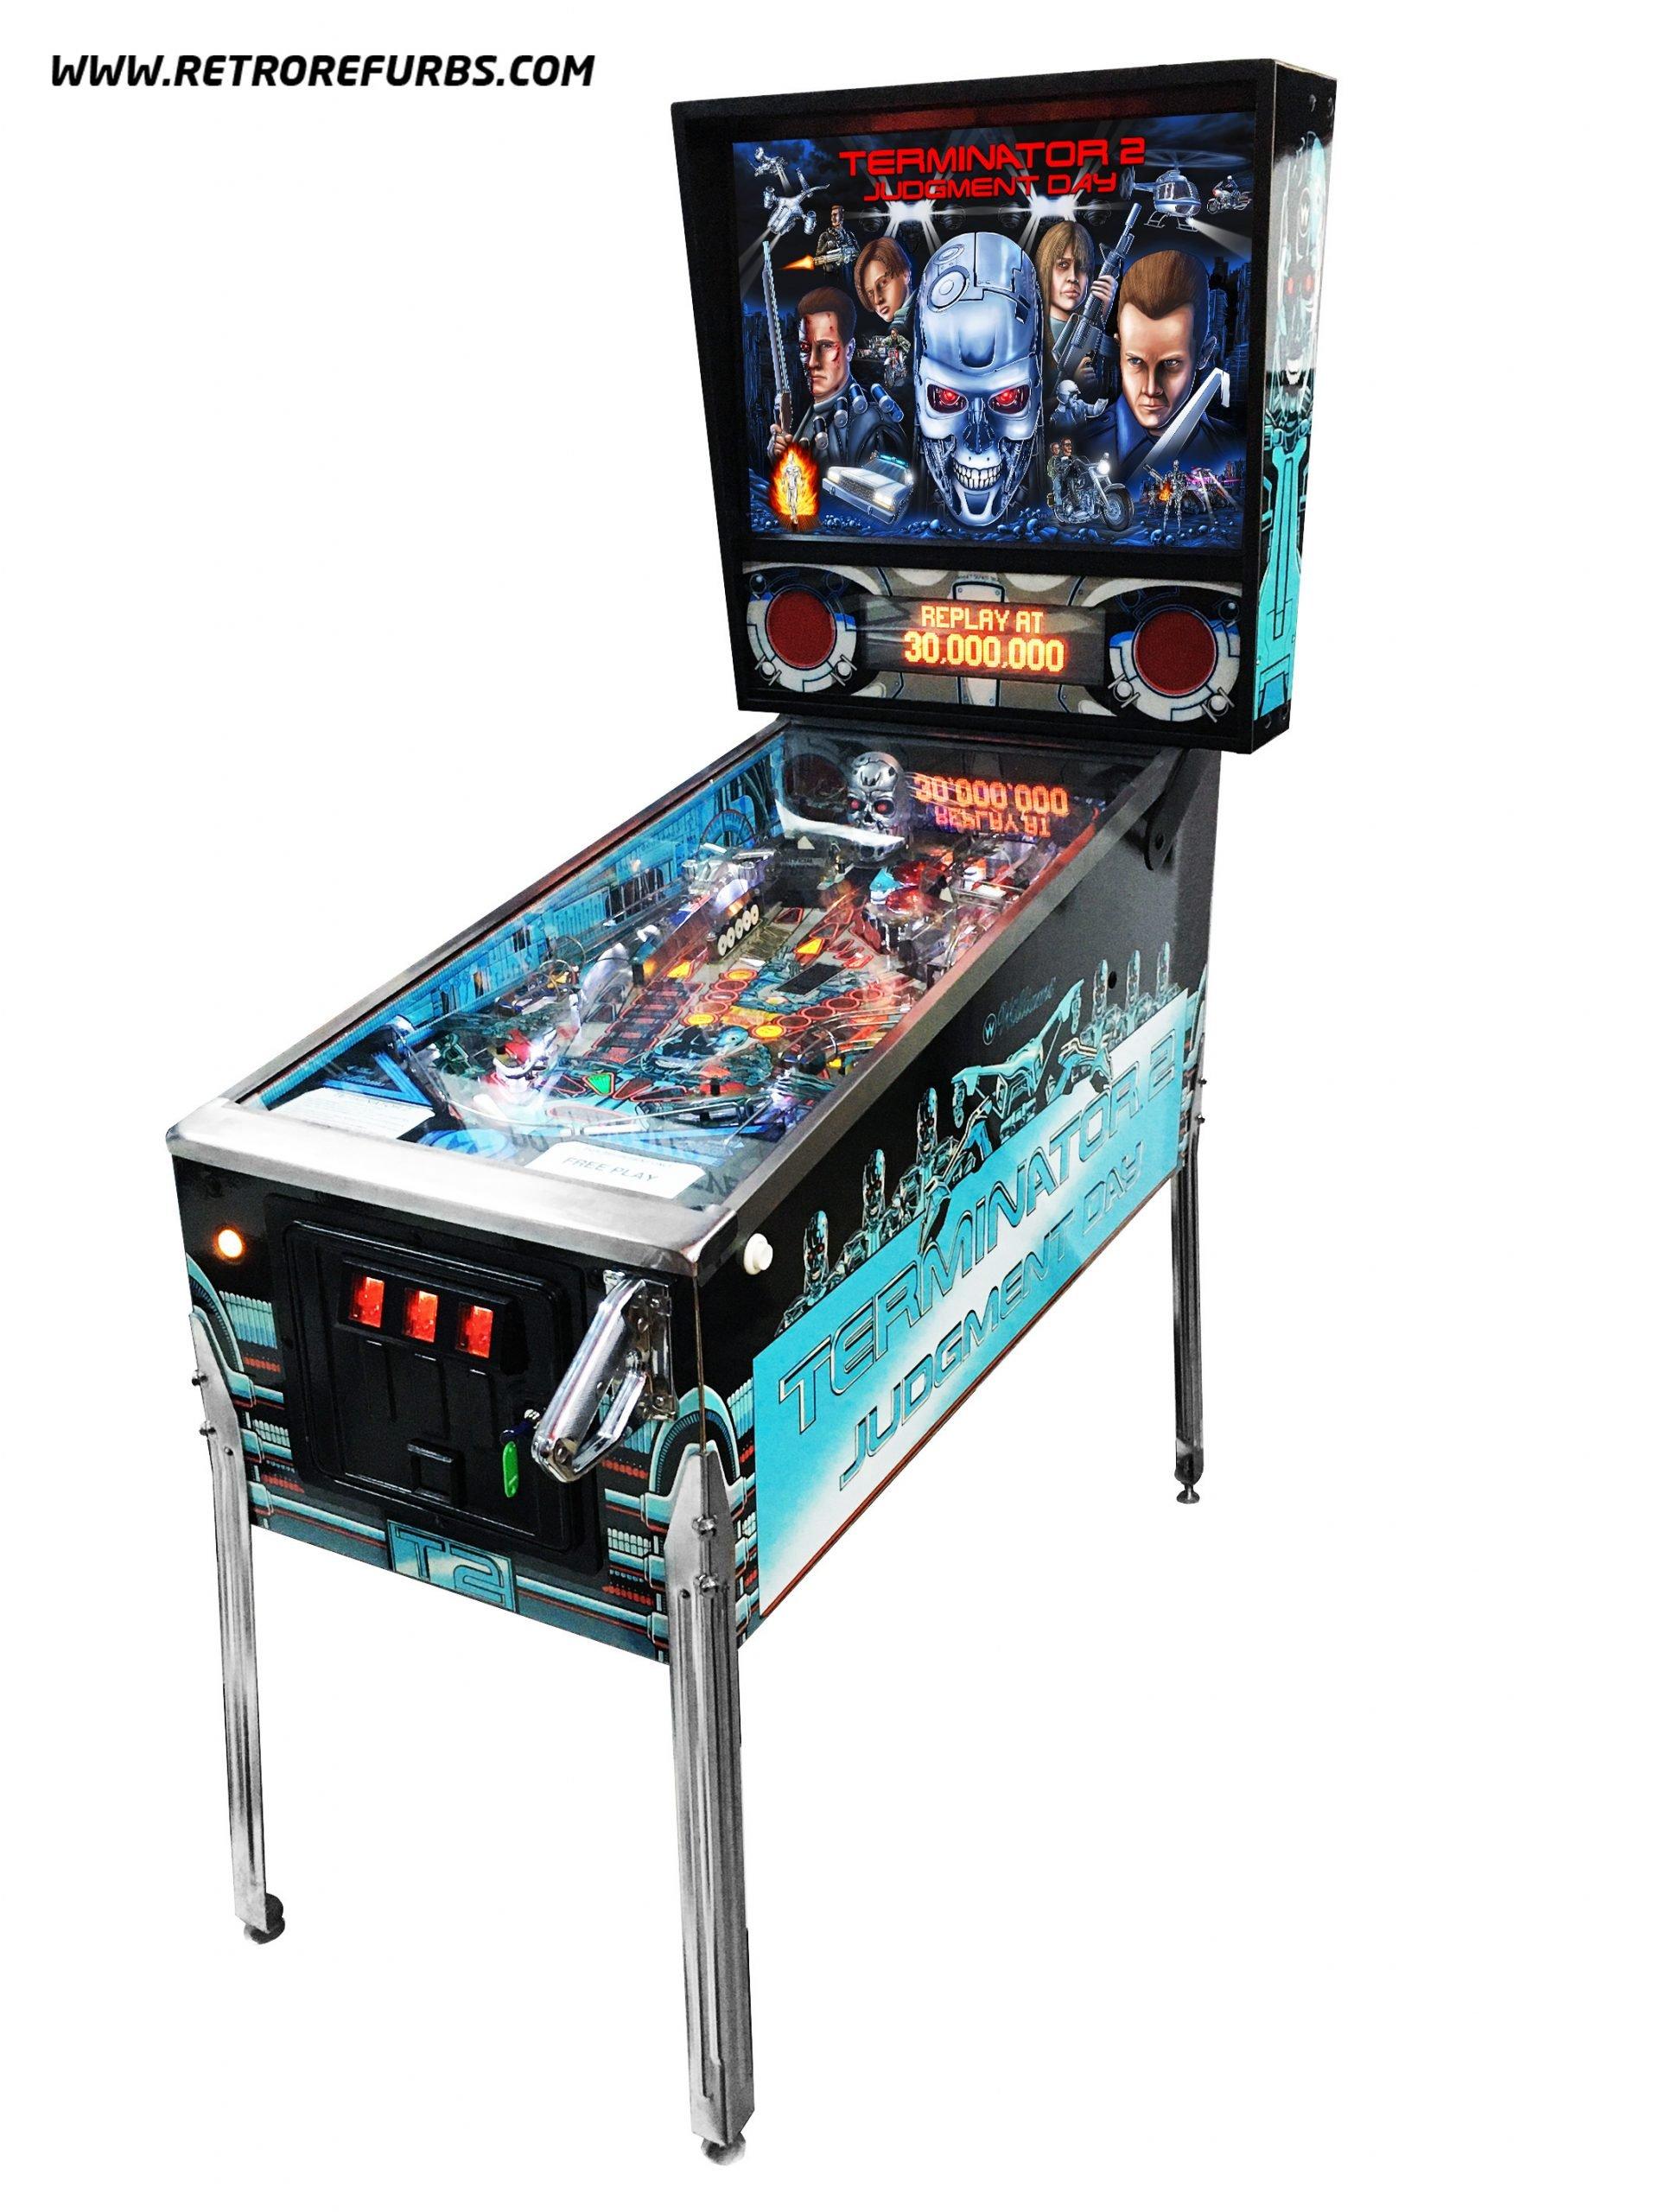 Terminator 2 pinball game slingo casino games